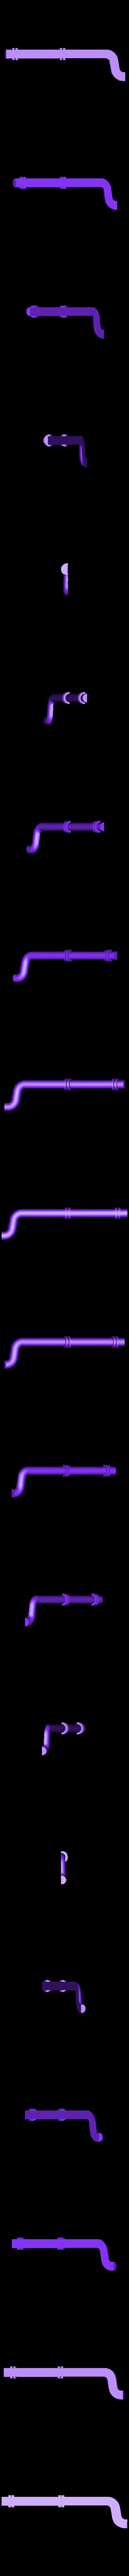 Steam_Pipe_-_Back_Engine-c.STL Download free STL file 4-8-8-4 Big Boy Locomotive • 3D printer object, RaymondDeLuca